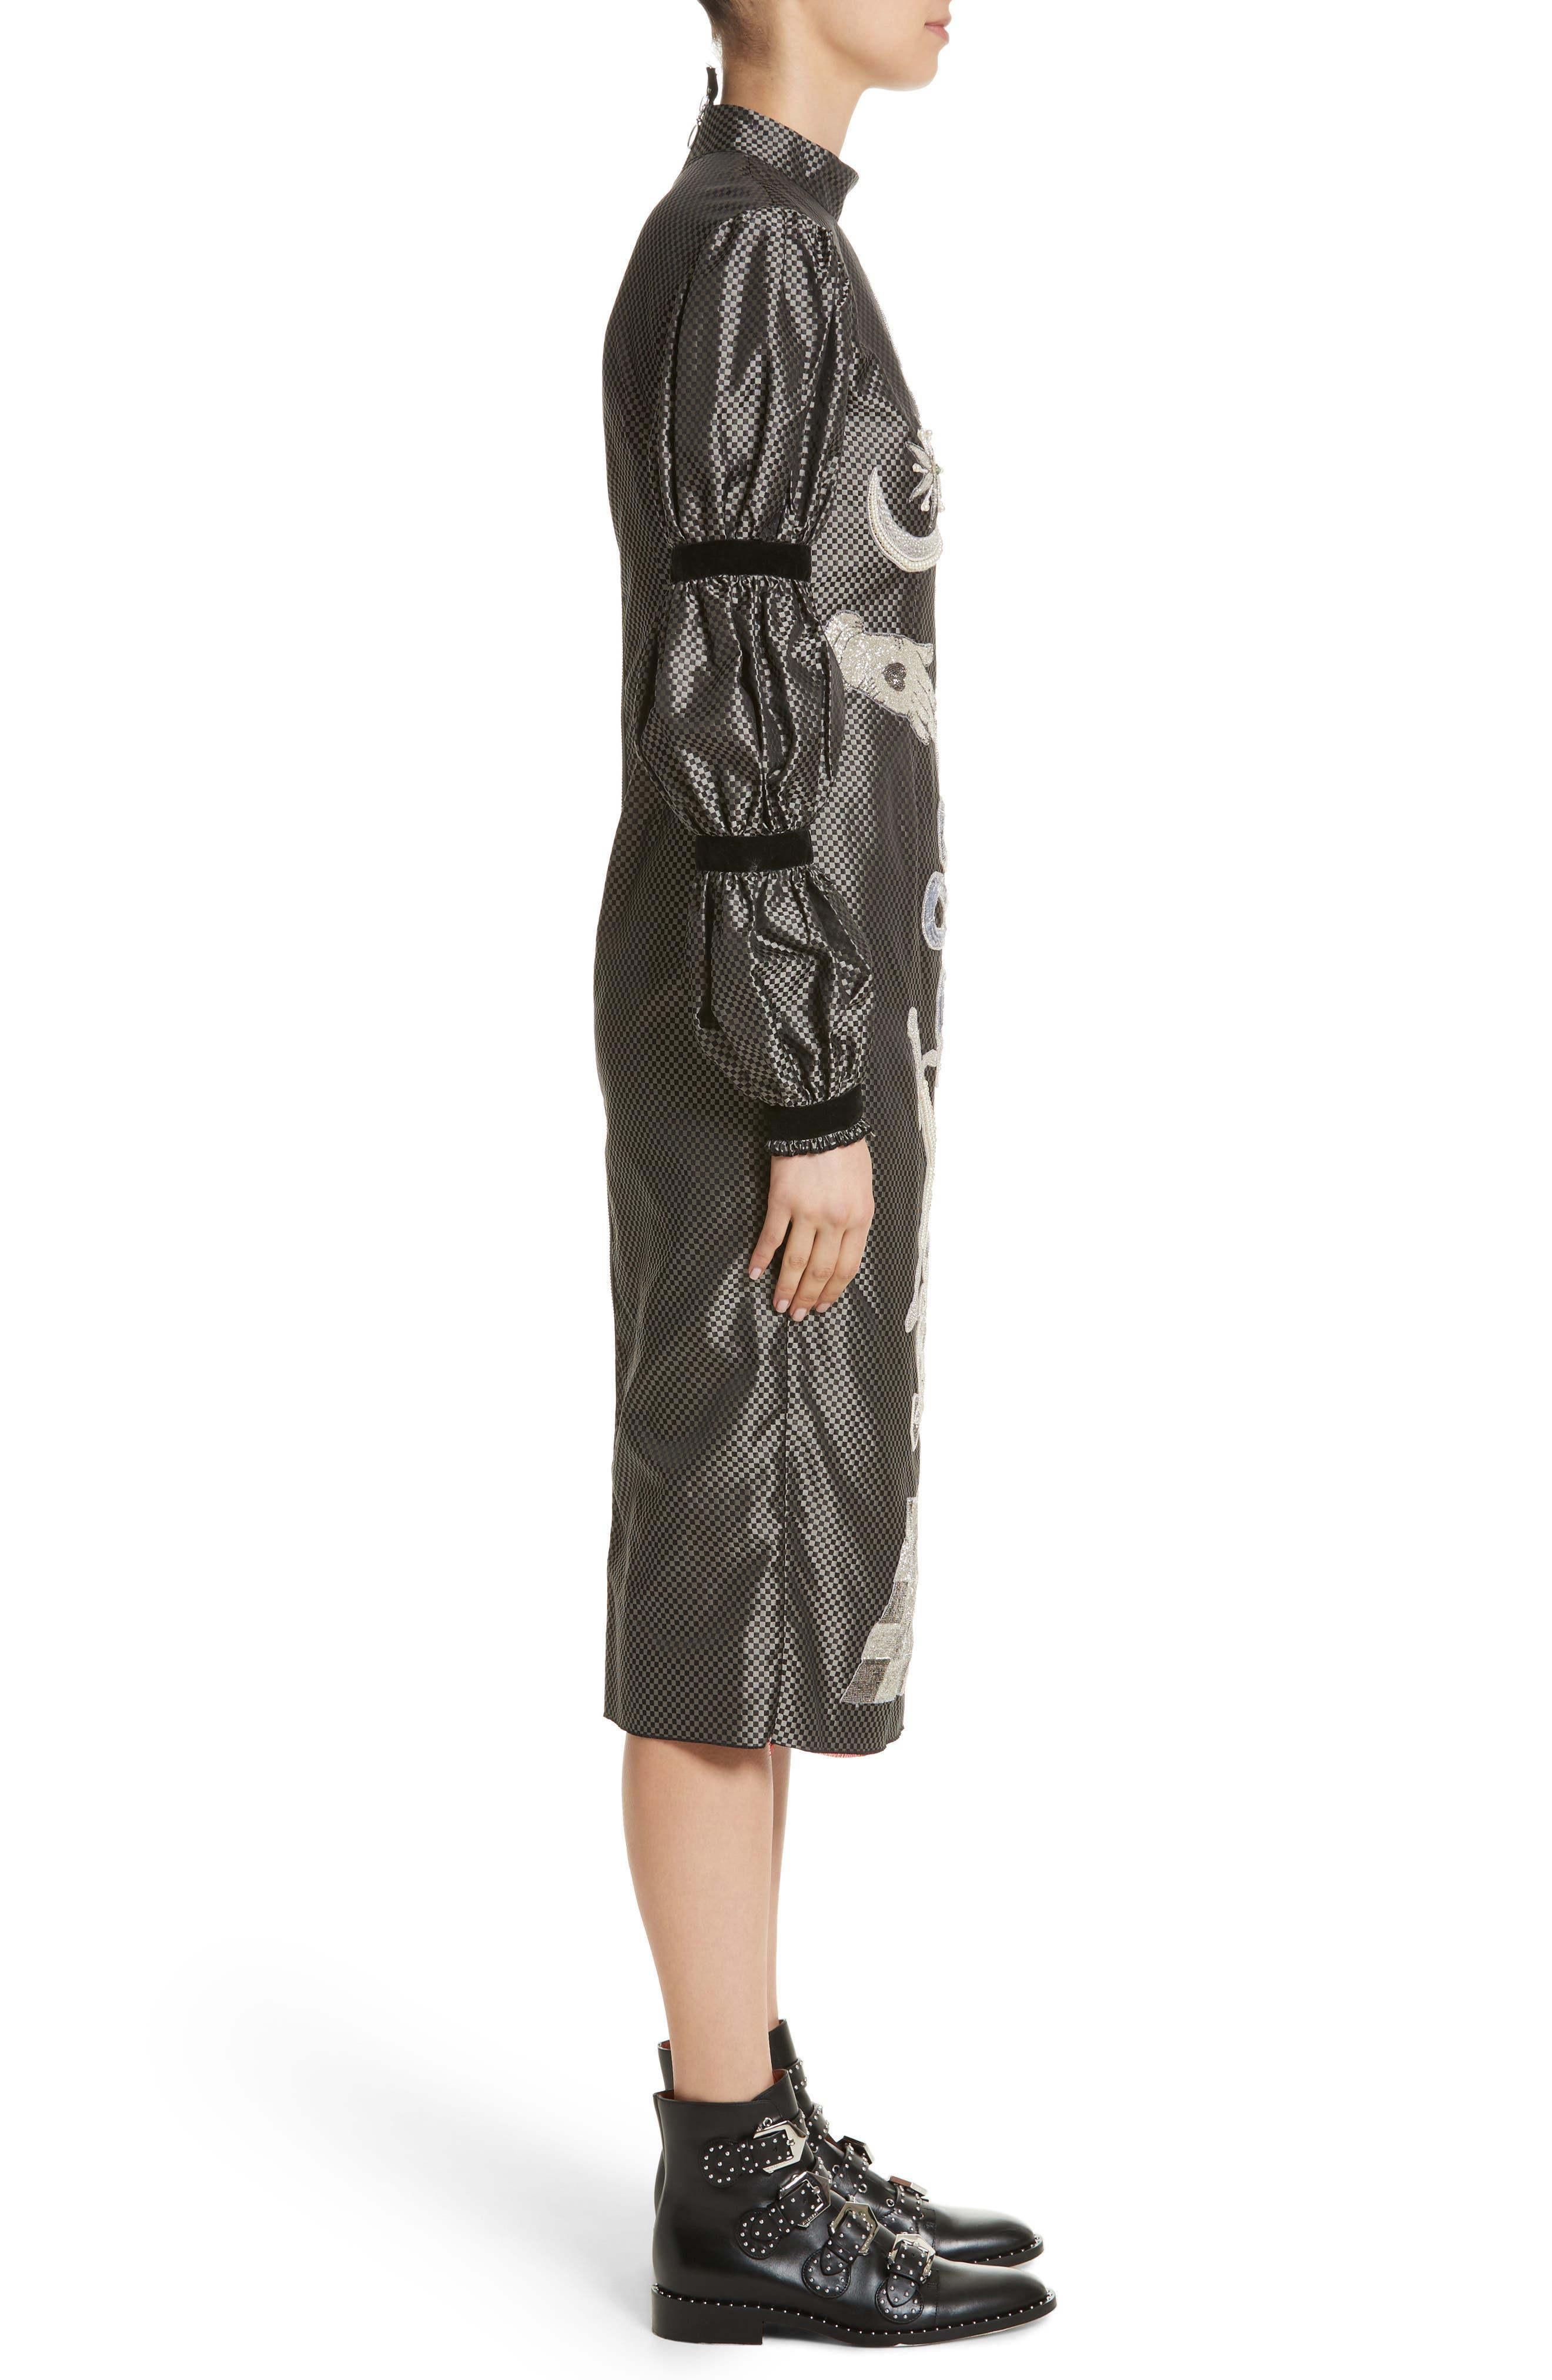 DILARA FINDIKOGLU,                             Alien Goddess Embellished Silk Dress,                             Alternate thumbnail 3, color,                             040